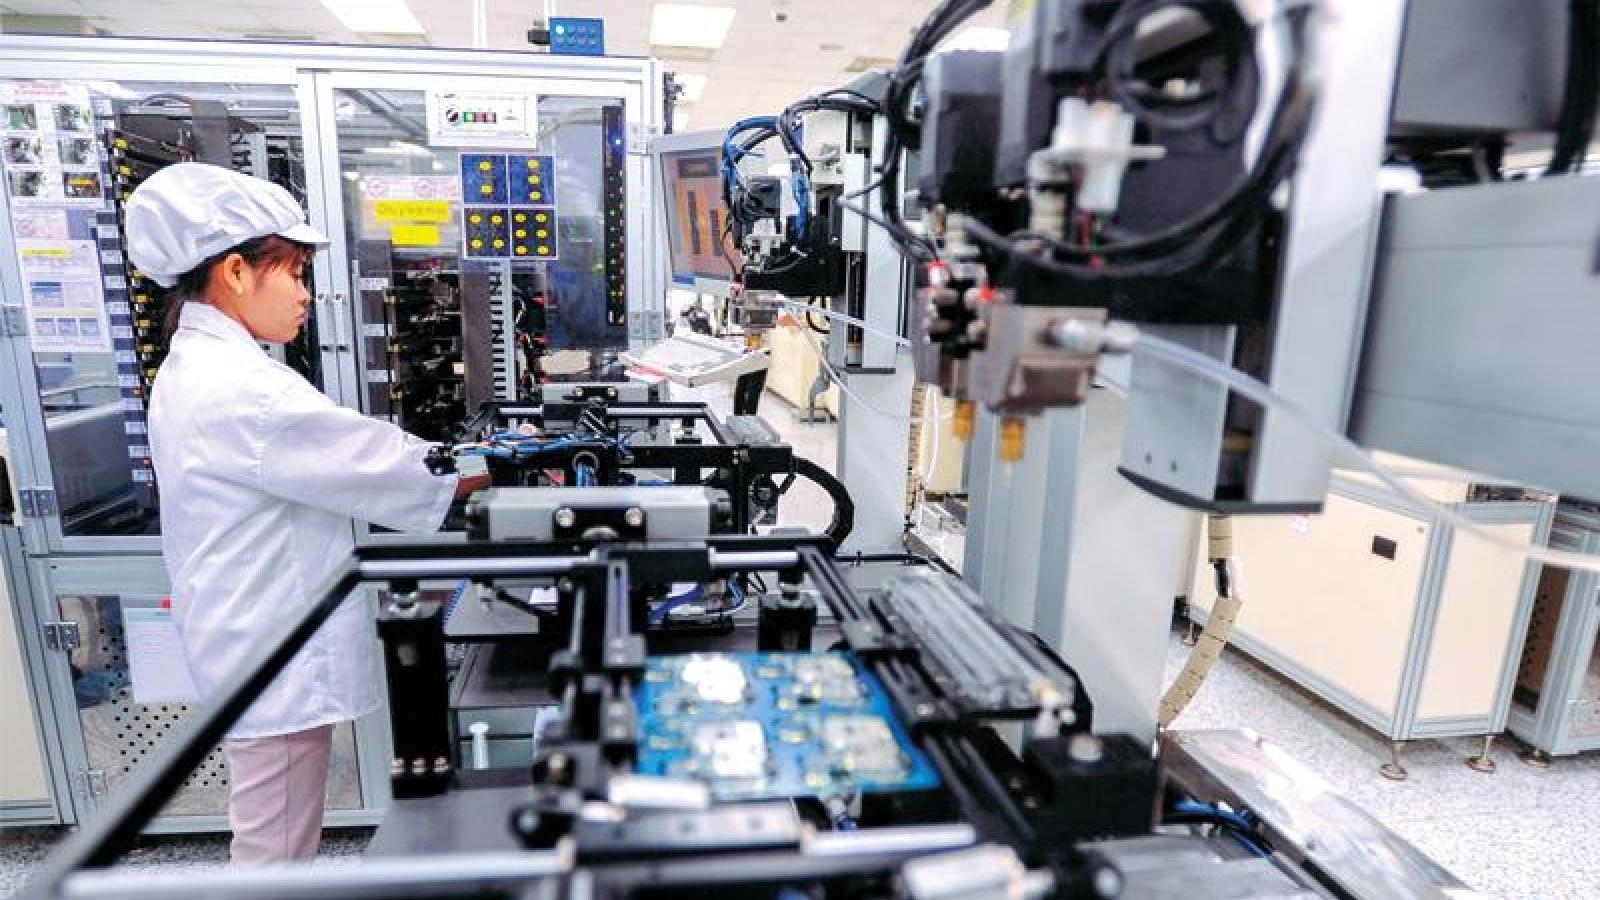 Vietnam welcomes fresh FDI inflows from overseas Vietnamese